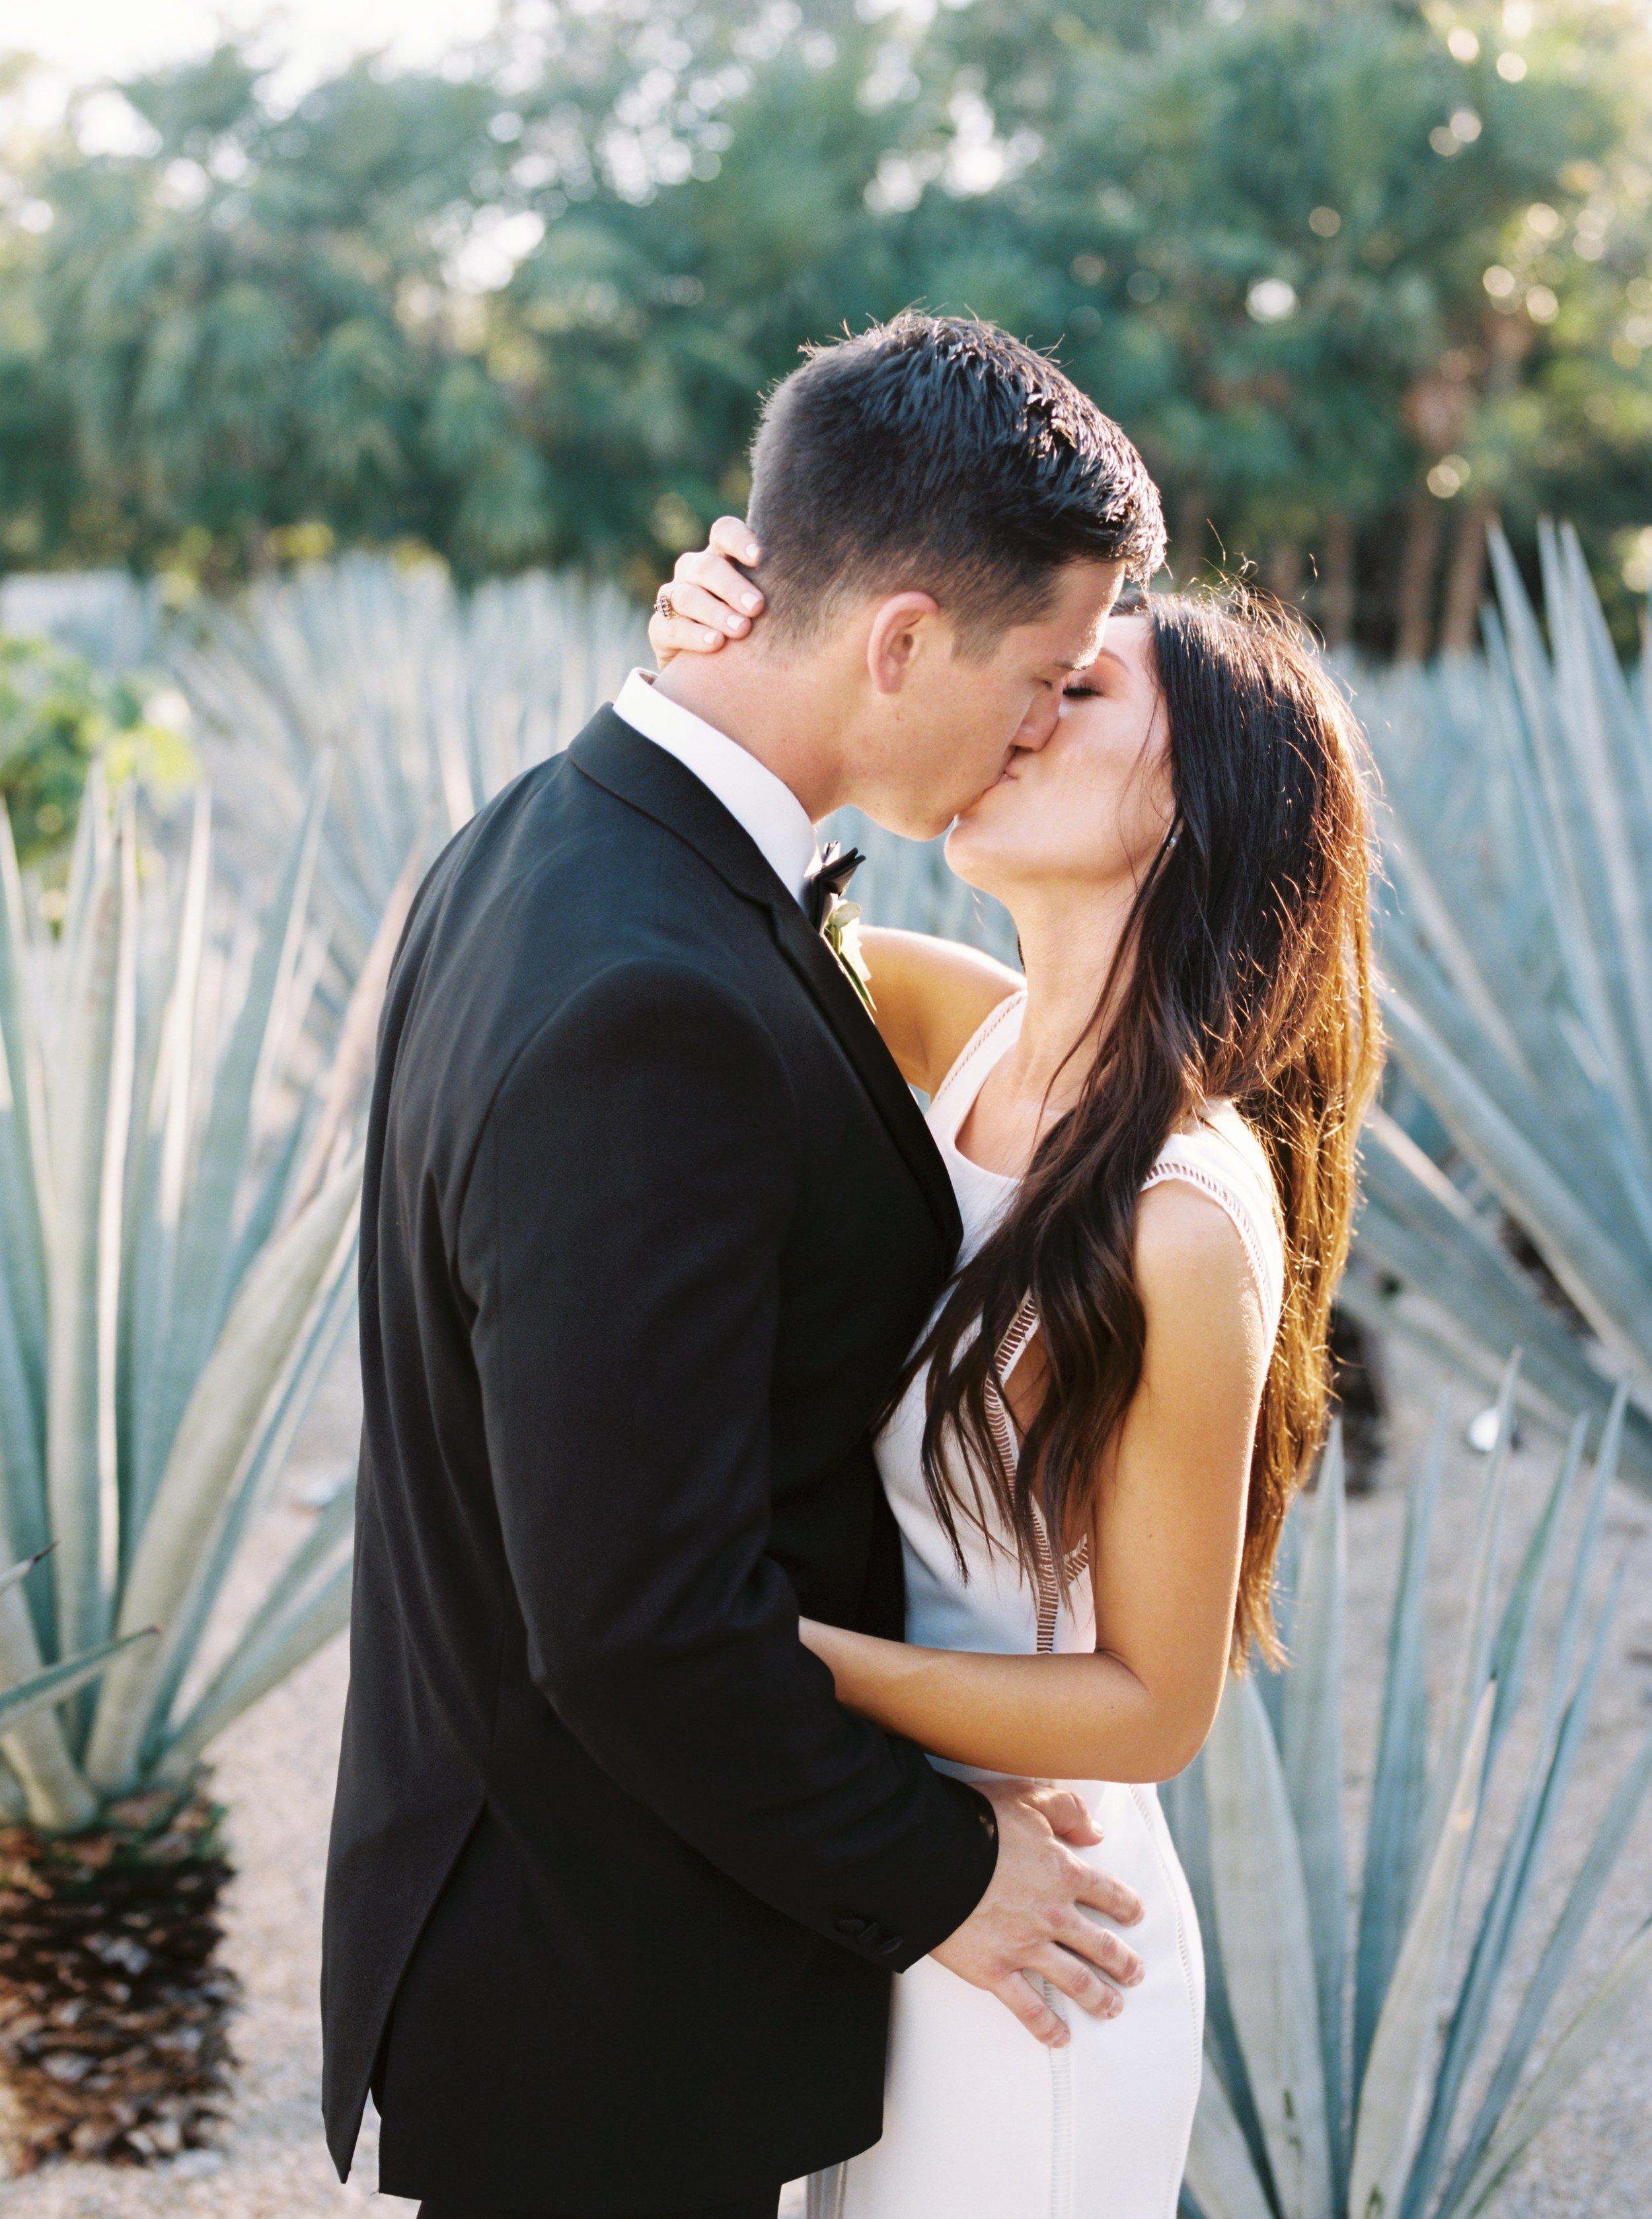 Kyle John l Fine Art Wedding Photography l Chicago, Copenhagen, California, New York, Destination l Blog l Brooke Boyd_The Film Poets_Tulum Wedding_22